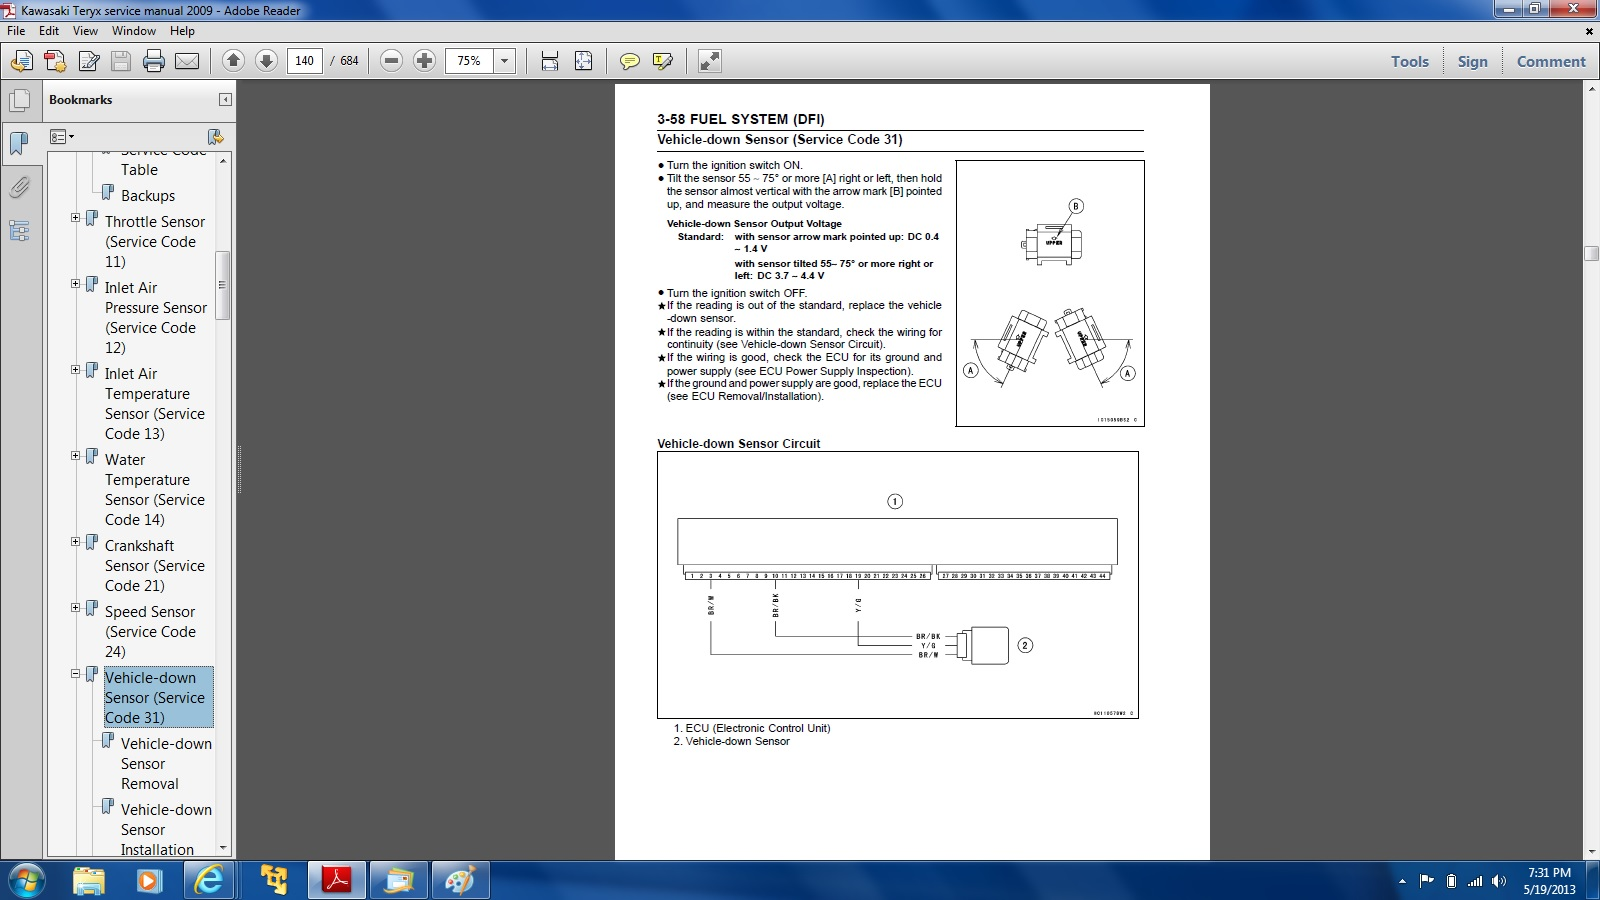 14192d1369010969 no power fuel pump ecu issues vds_2 no power to fuel pump ecu issues? kawasaki teryx forum Fuel Pump Wiring Harness Diagram at arjmand.co